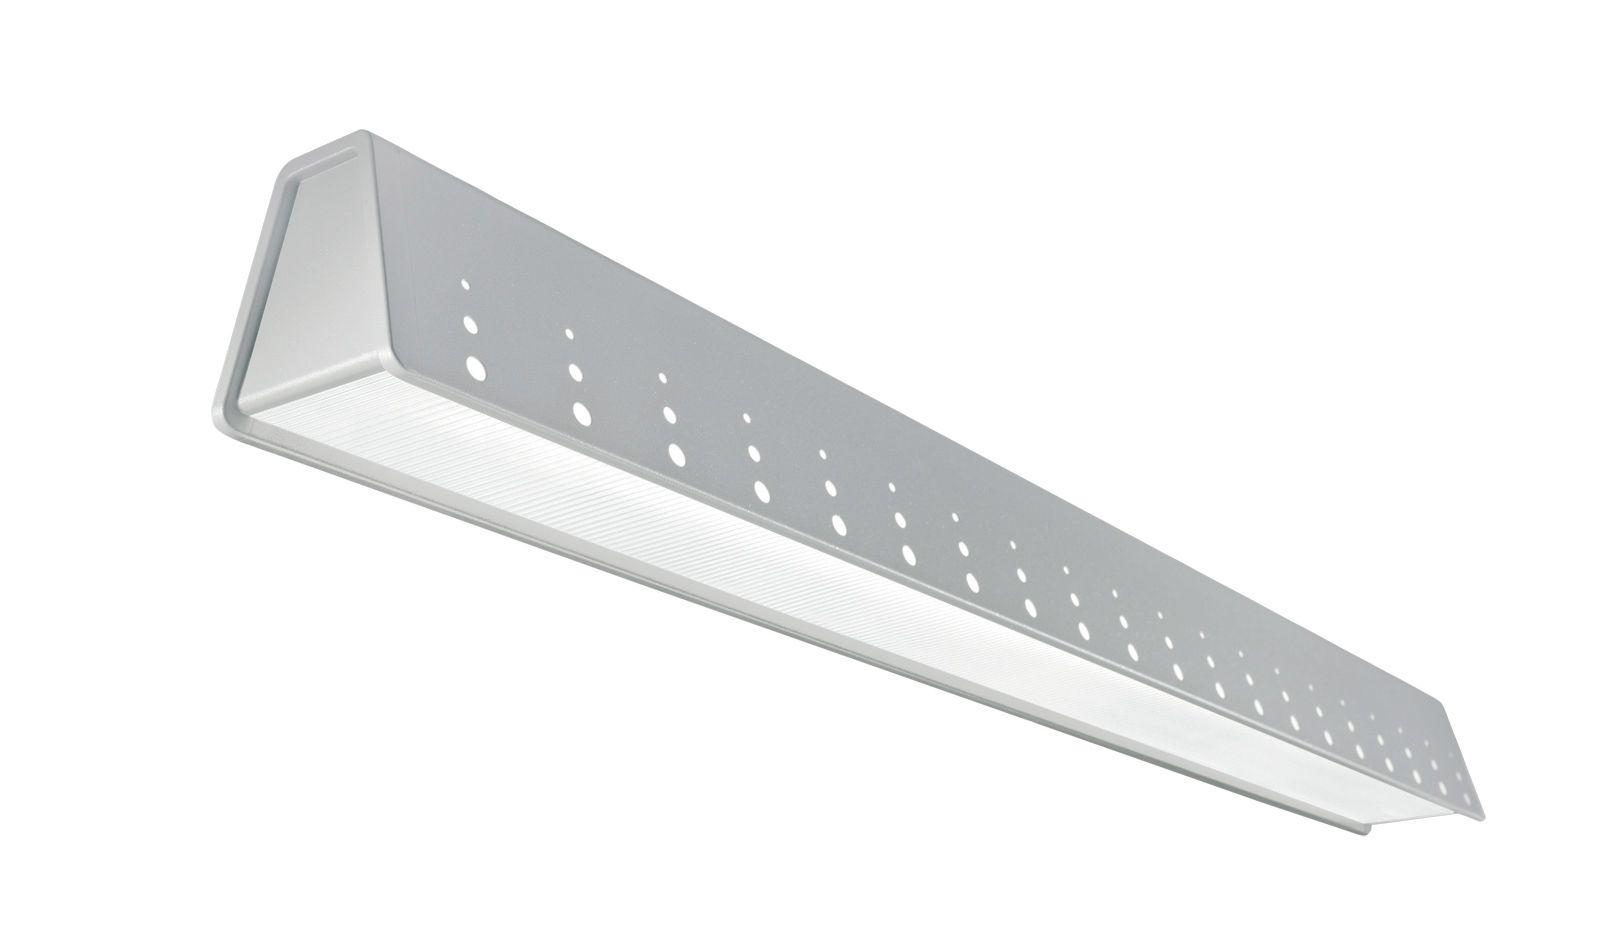 Philips Ledalite 1201 Jump Led Linear Pendant Light Fixture Ideal For Commercial Office Lighting Lications 4 Ft